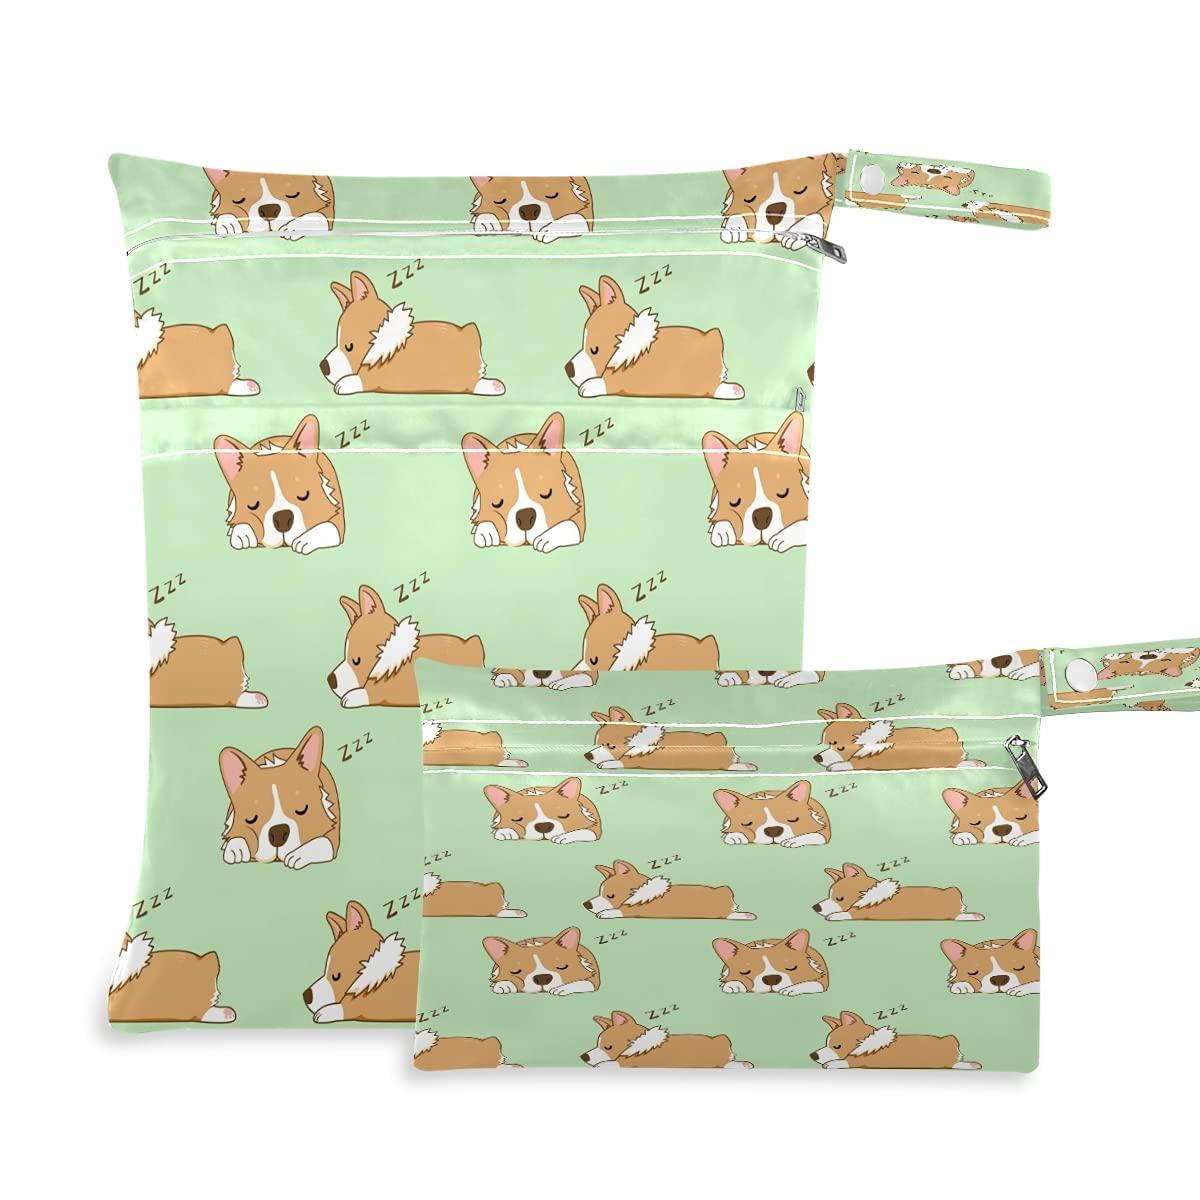 MAHU Wet Dry Bag 2 Pack Sleepy Corgi Dog Animal Pattern Waterproof Kids Baby Cloth Diaper Wet Bags Organizer Pouch Zippered Pockets Yoga Gym Wet Dry Bag for Travel Swimsuits